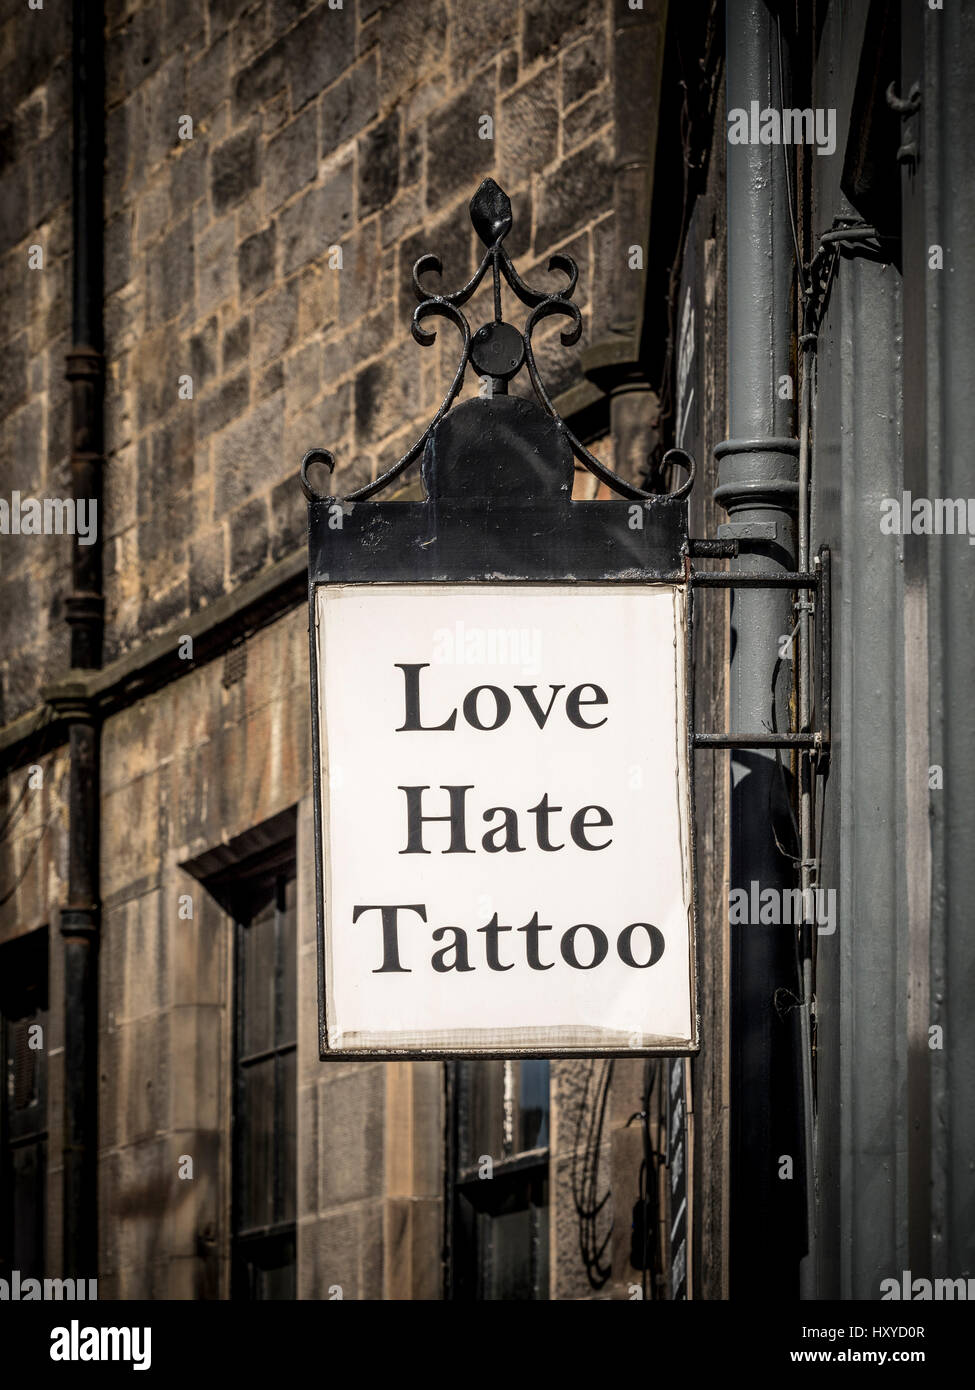 Love Hate Tattoo sign outside tattoo artist shop, Edinburgh, Scotland. - Stock Image